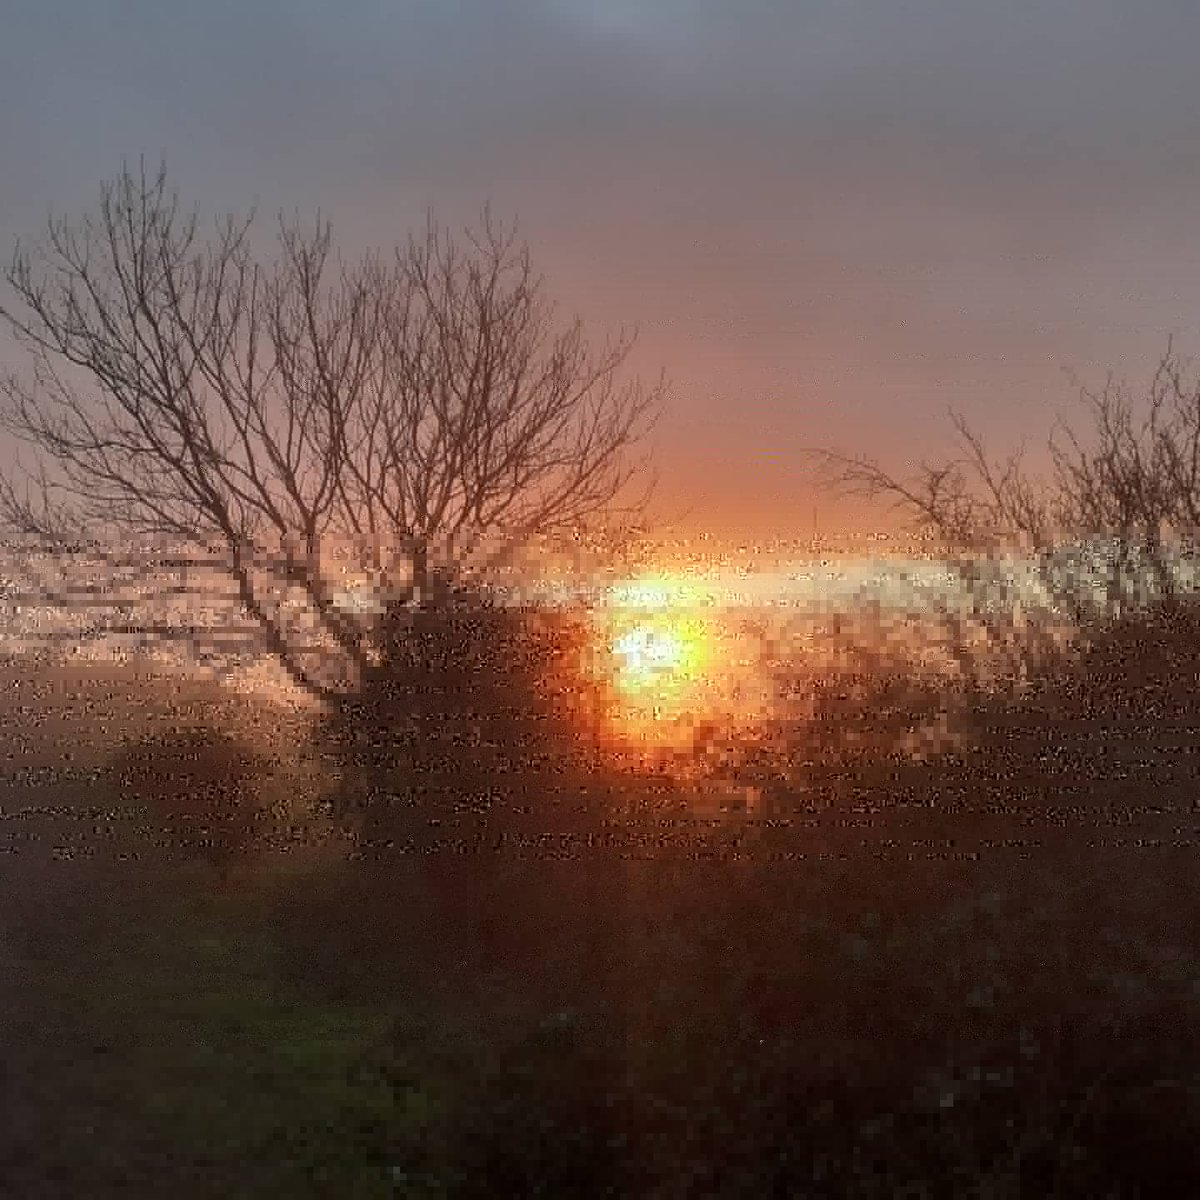 Scout Scar  #nofilter #sunset #Kendal #Cumbria #notjustlakespic.twitter.com/6OWKomU5Am